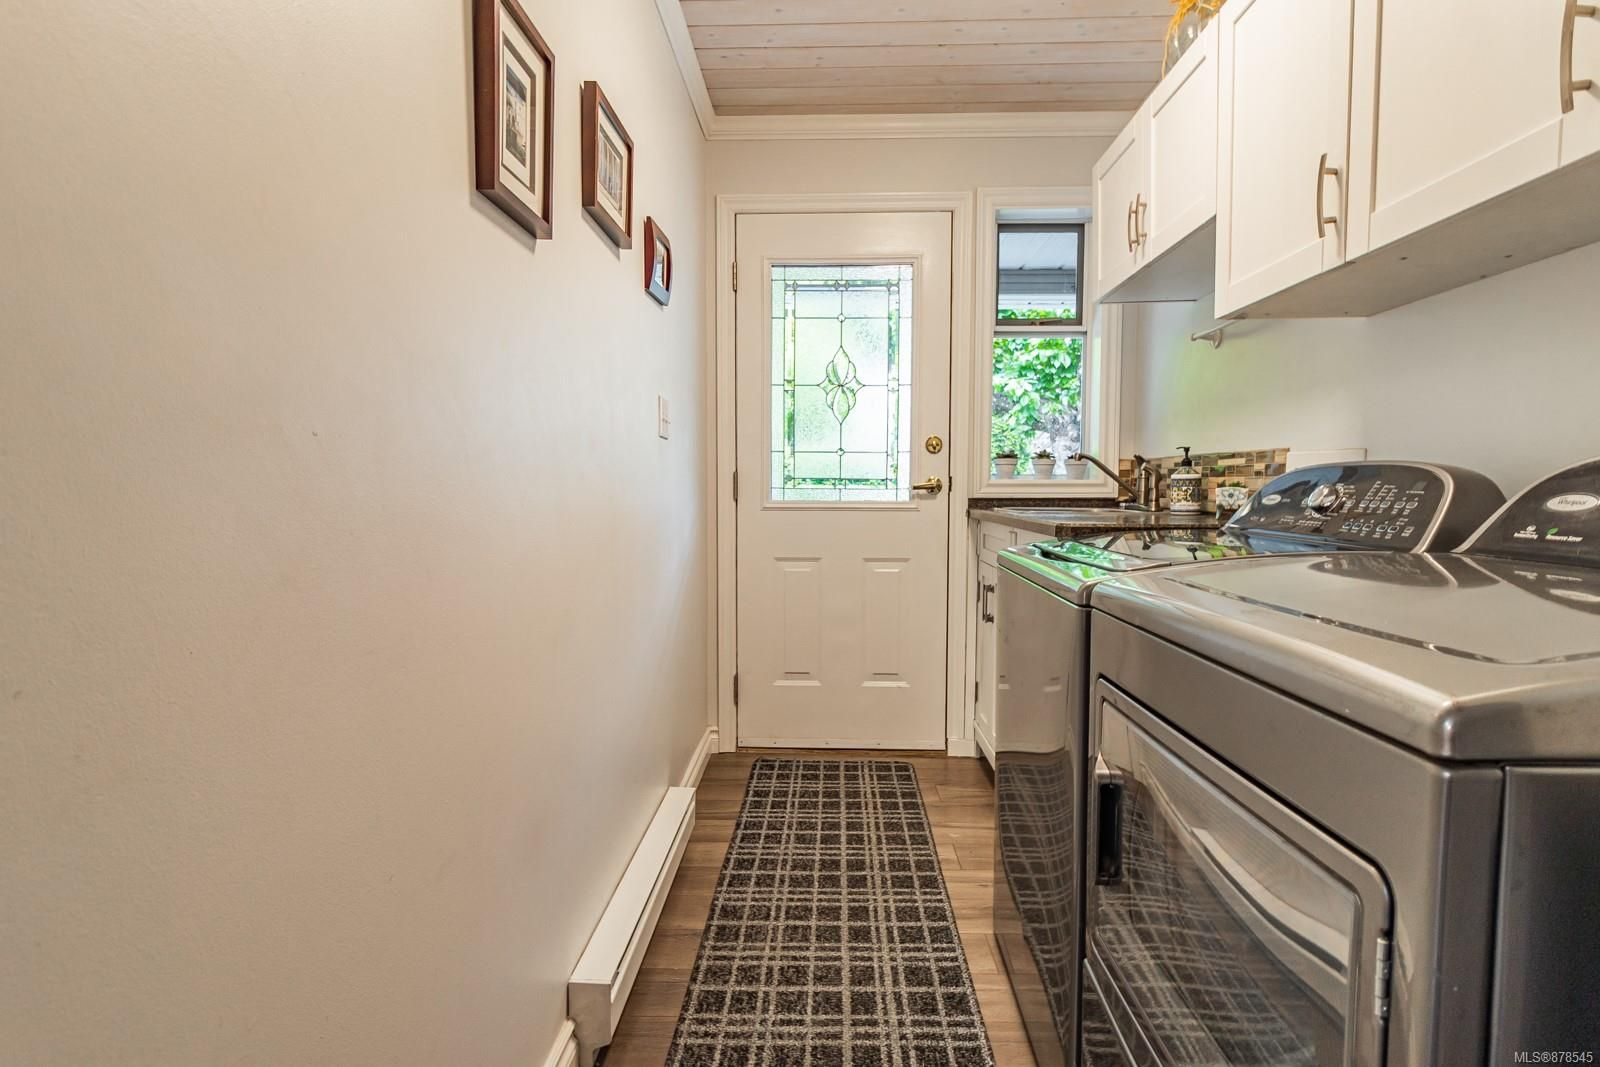 Photo 25: Photos: 1070 Symons Cres in : PQ Qualicum Beach House for sale (Parksville/Qualicum)  : MLS®# 878545